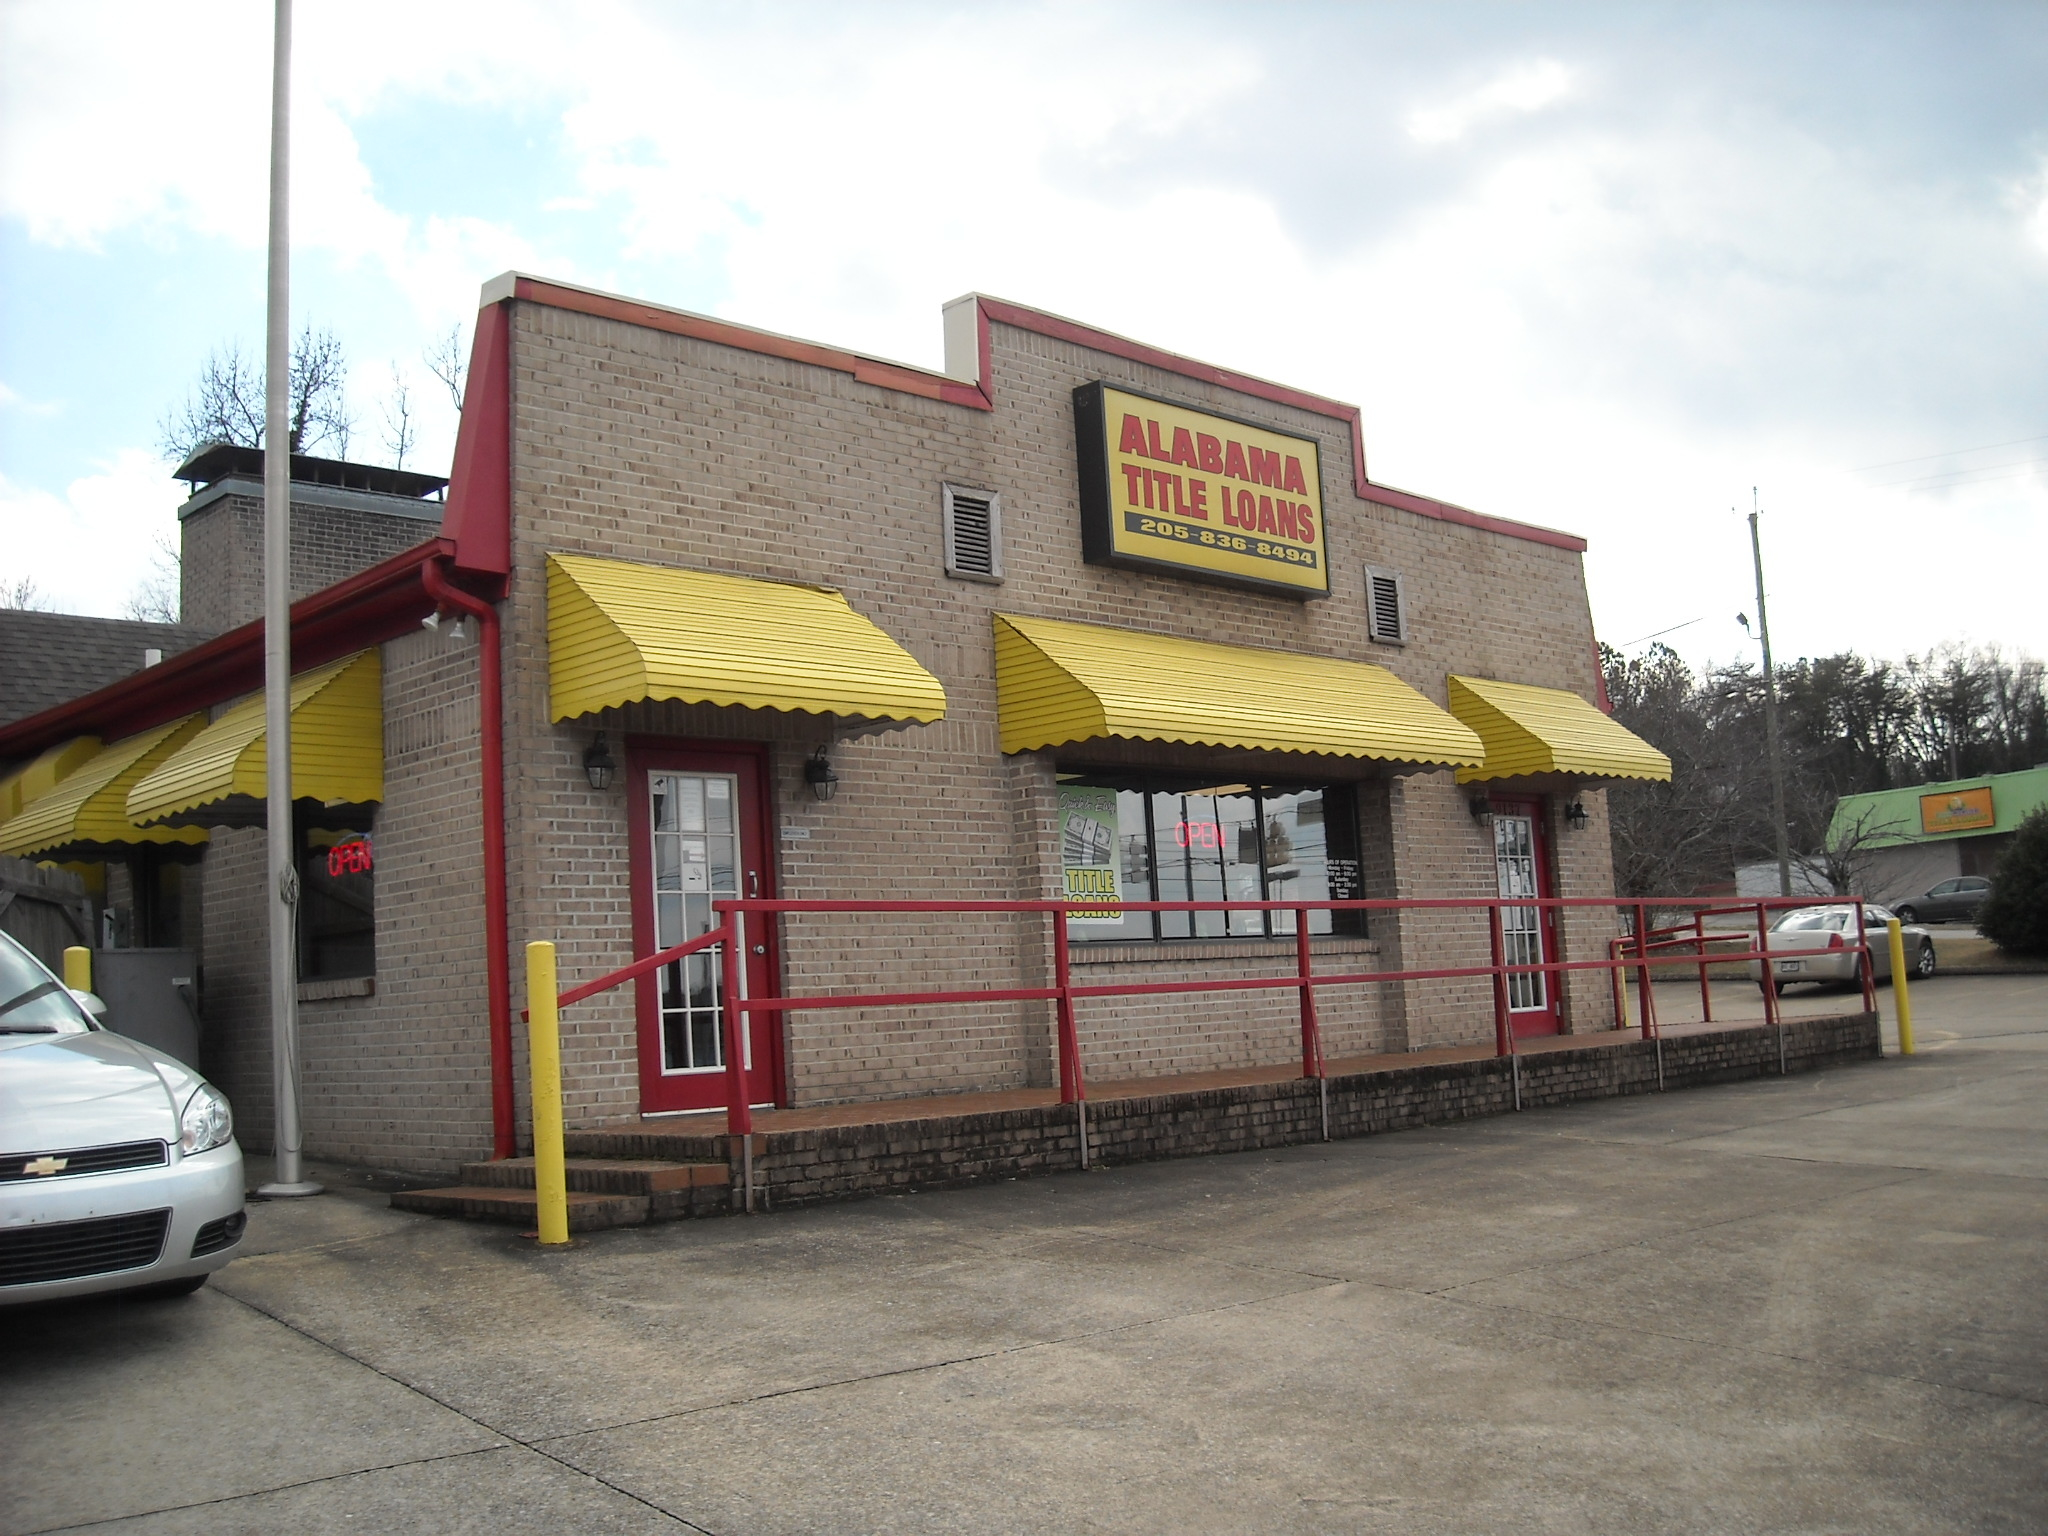 Alabama Title Loans image 0